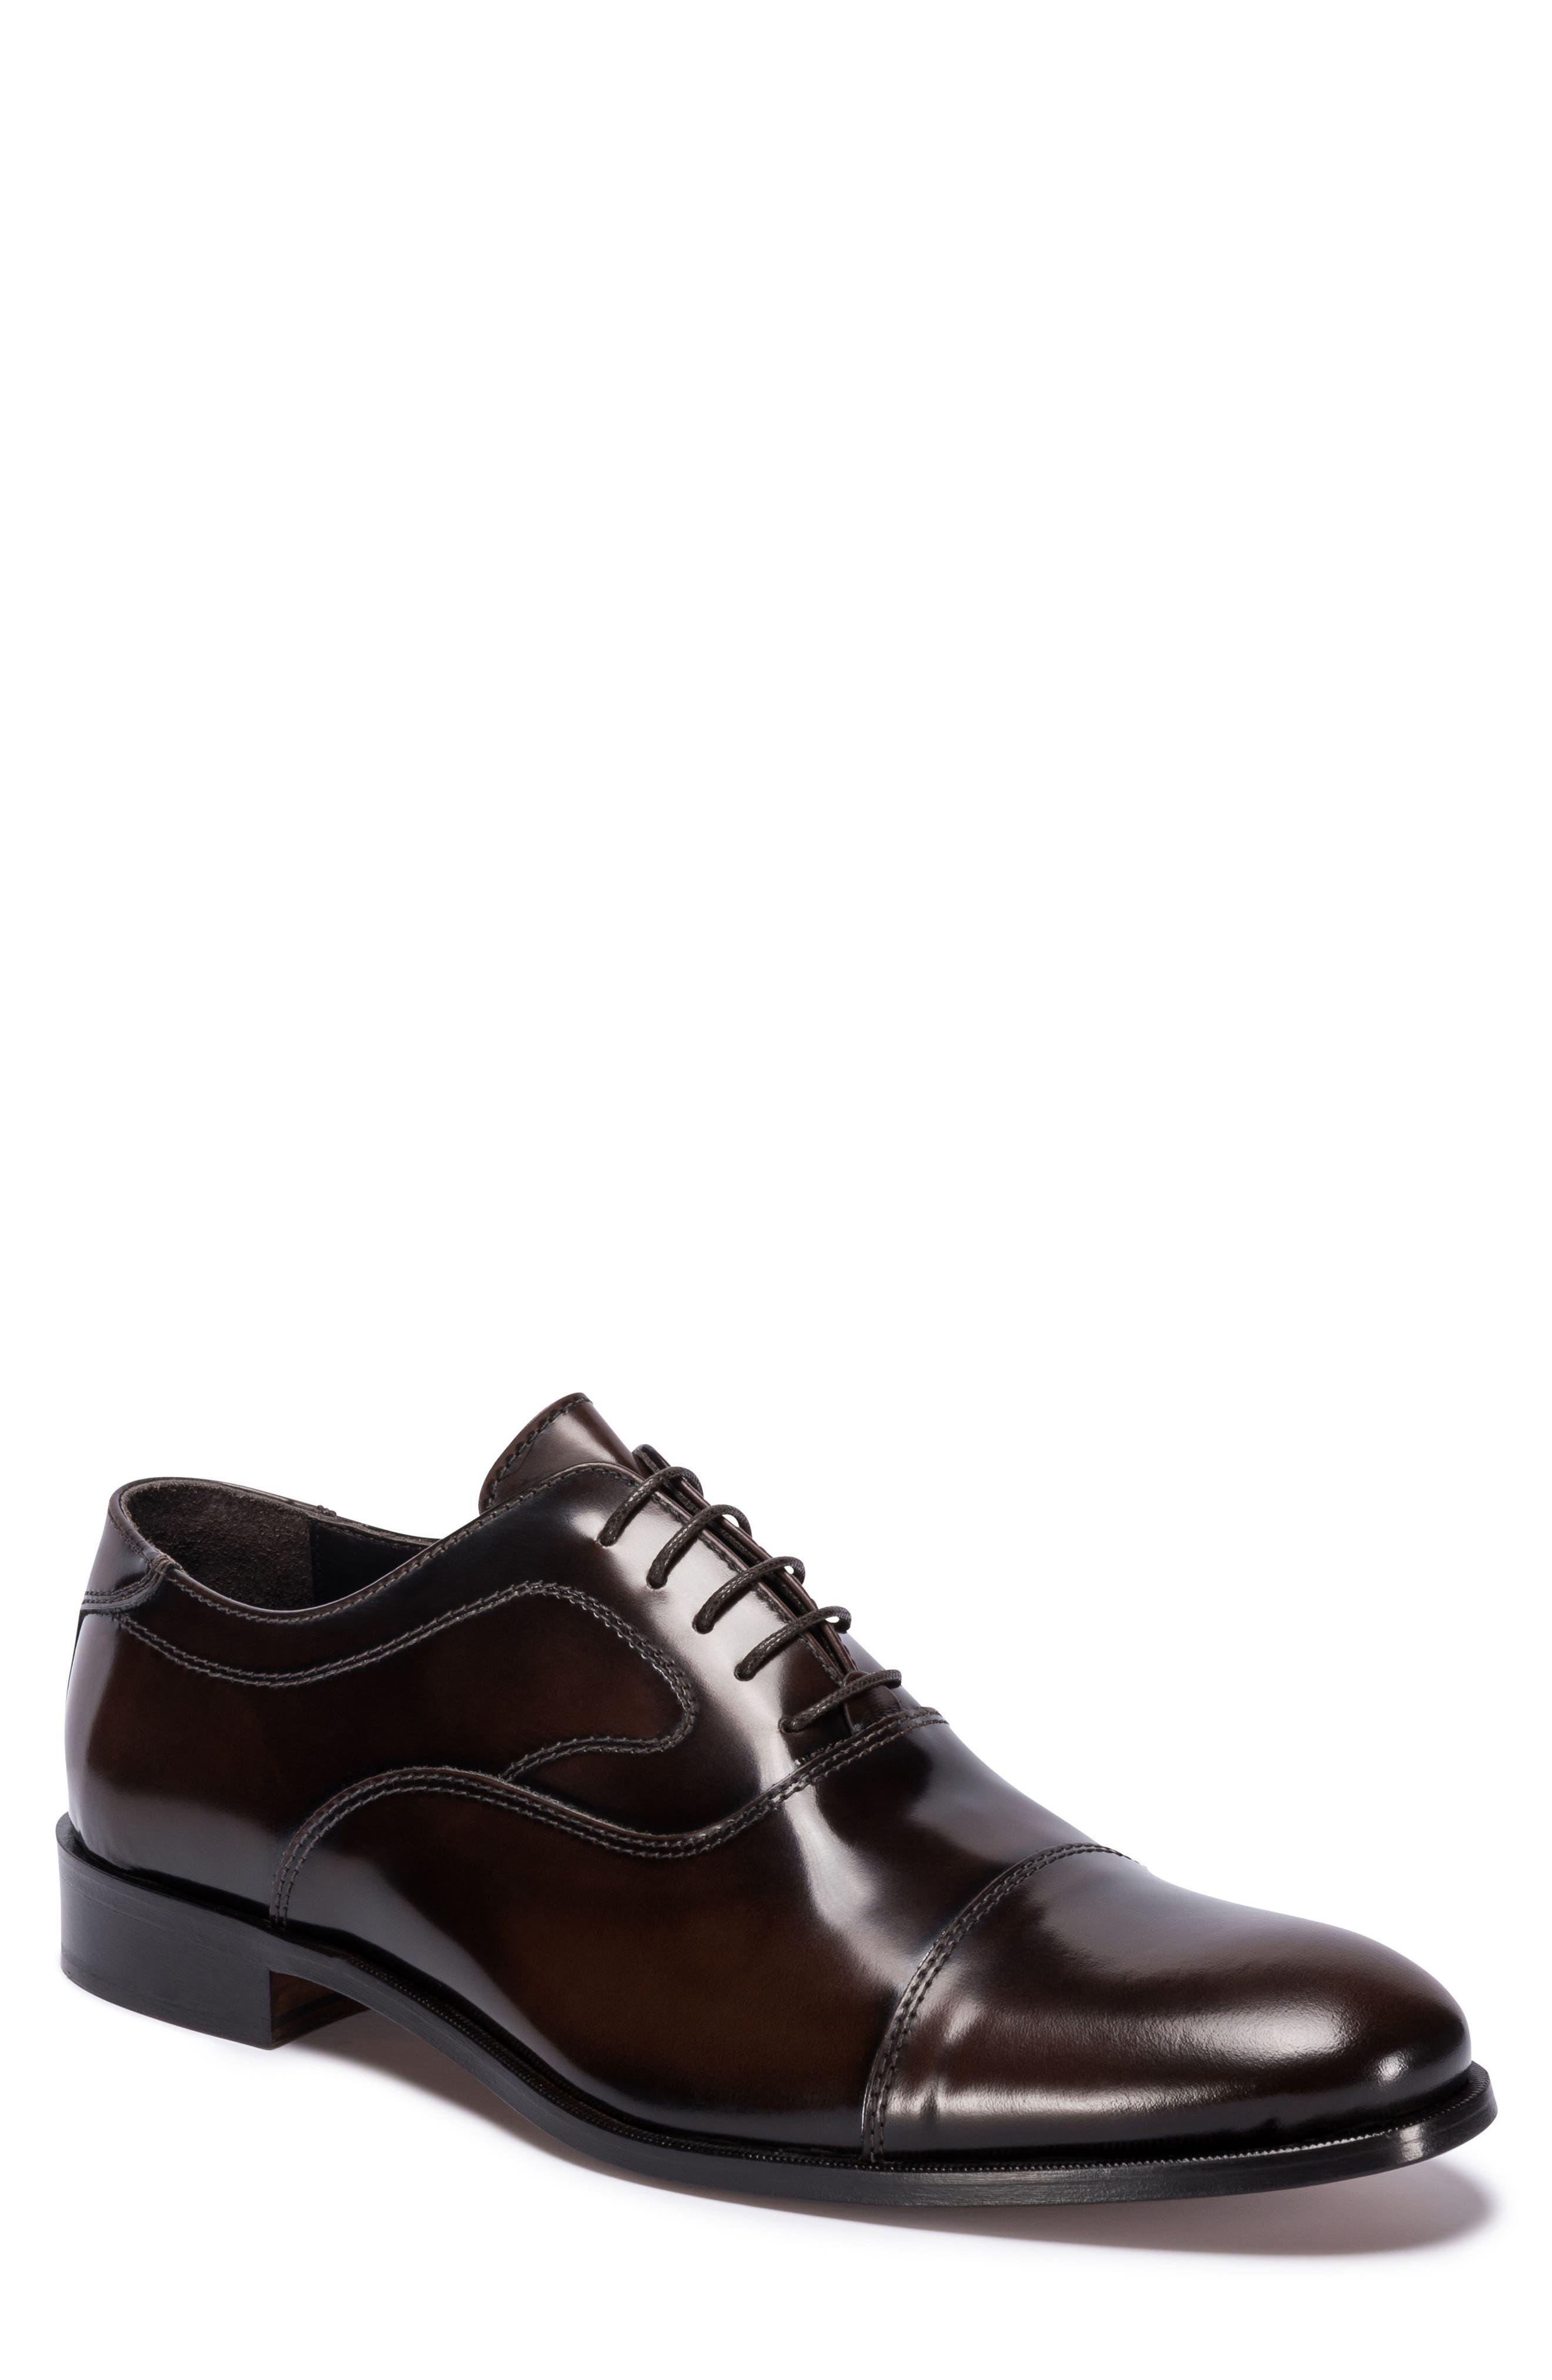 Garda Cap Toe Oxford,                         Main,                         color, Brown Leather